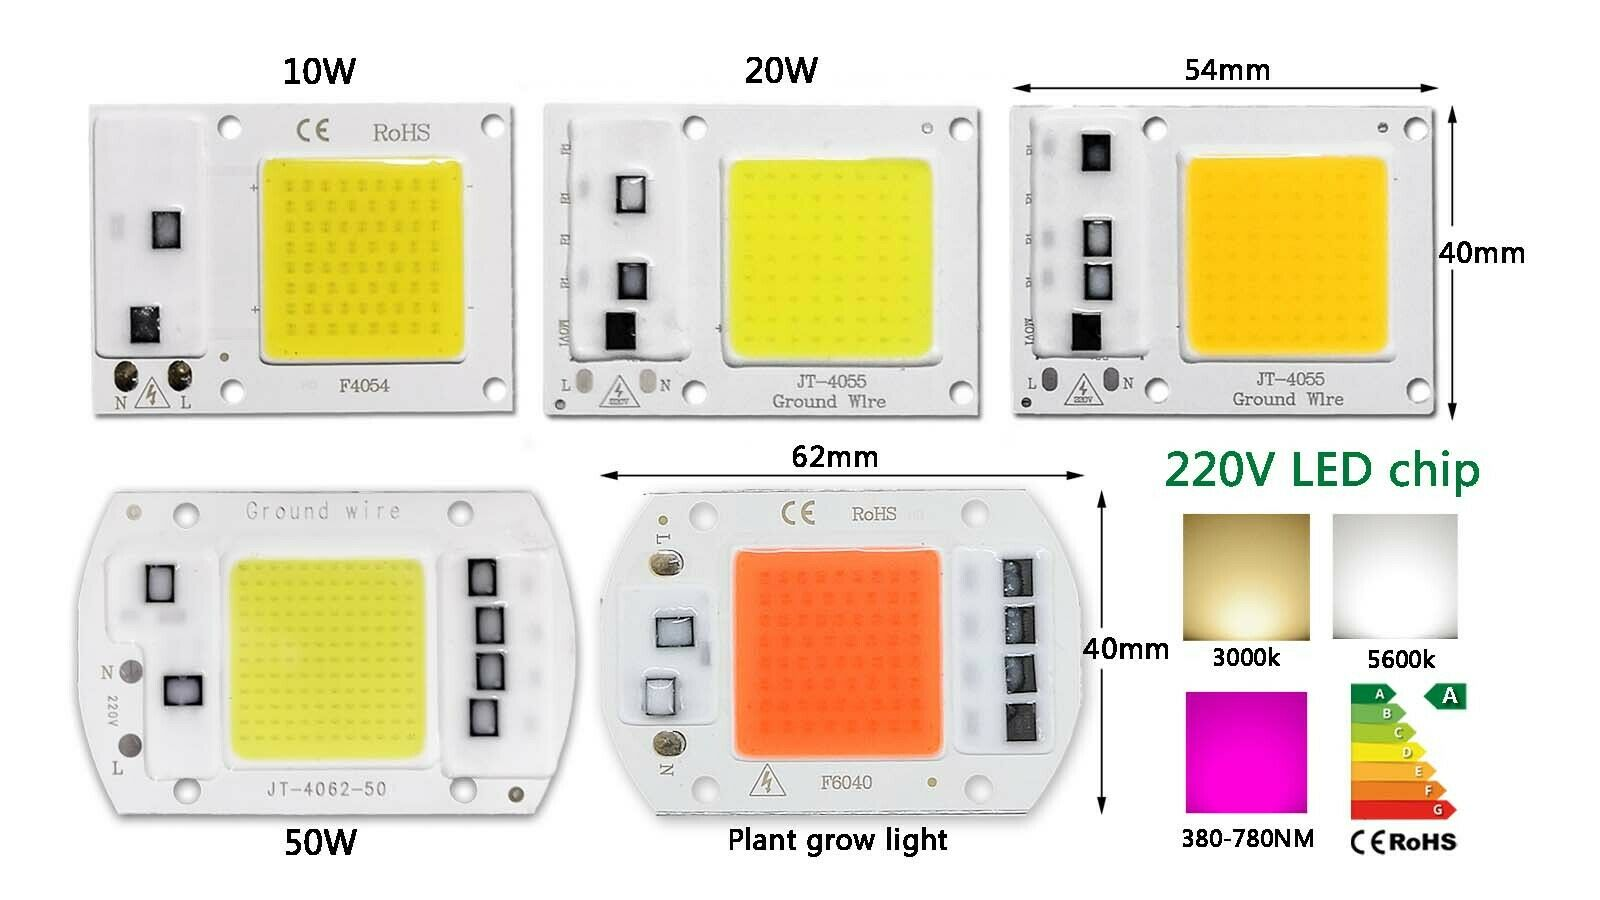 COB LED Chip 20W 33V 600mA 2000lm 3000K lextar PB20U01 3000K Power LED 28x28